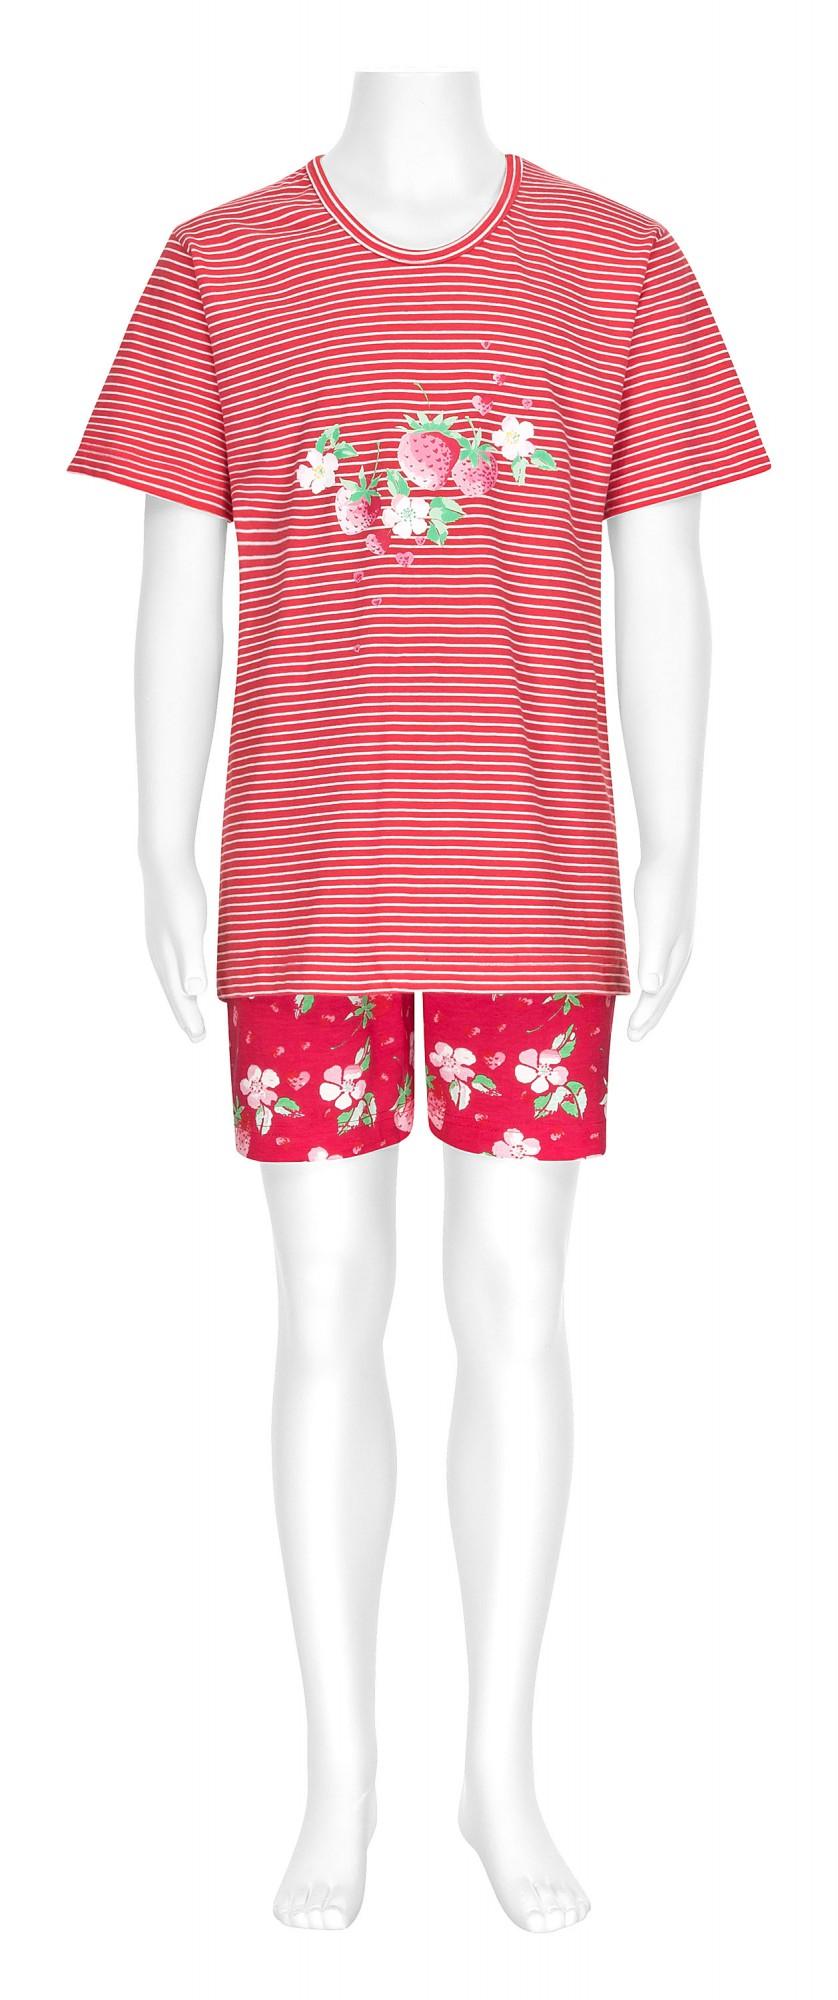 Cooler Mädchen Pyjama kurzarm gestreift – 161 405 90 838 – Bild 2